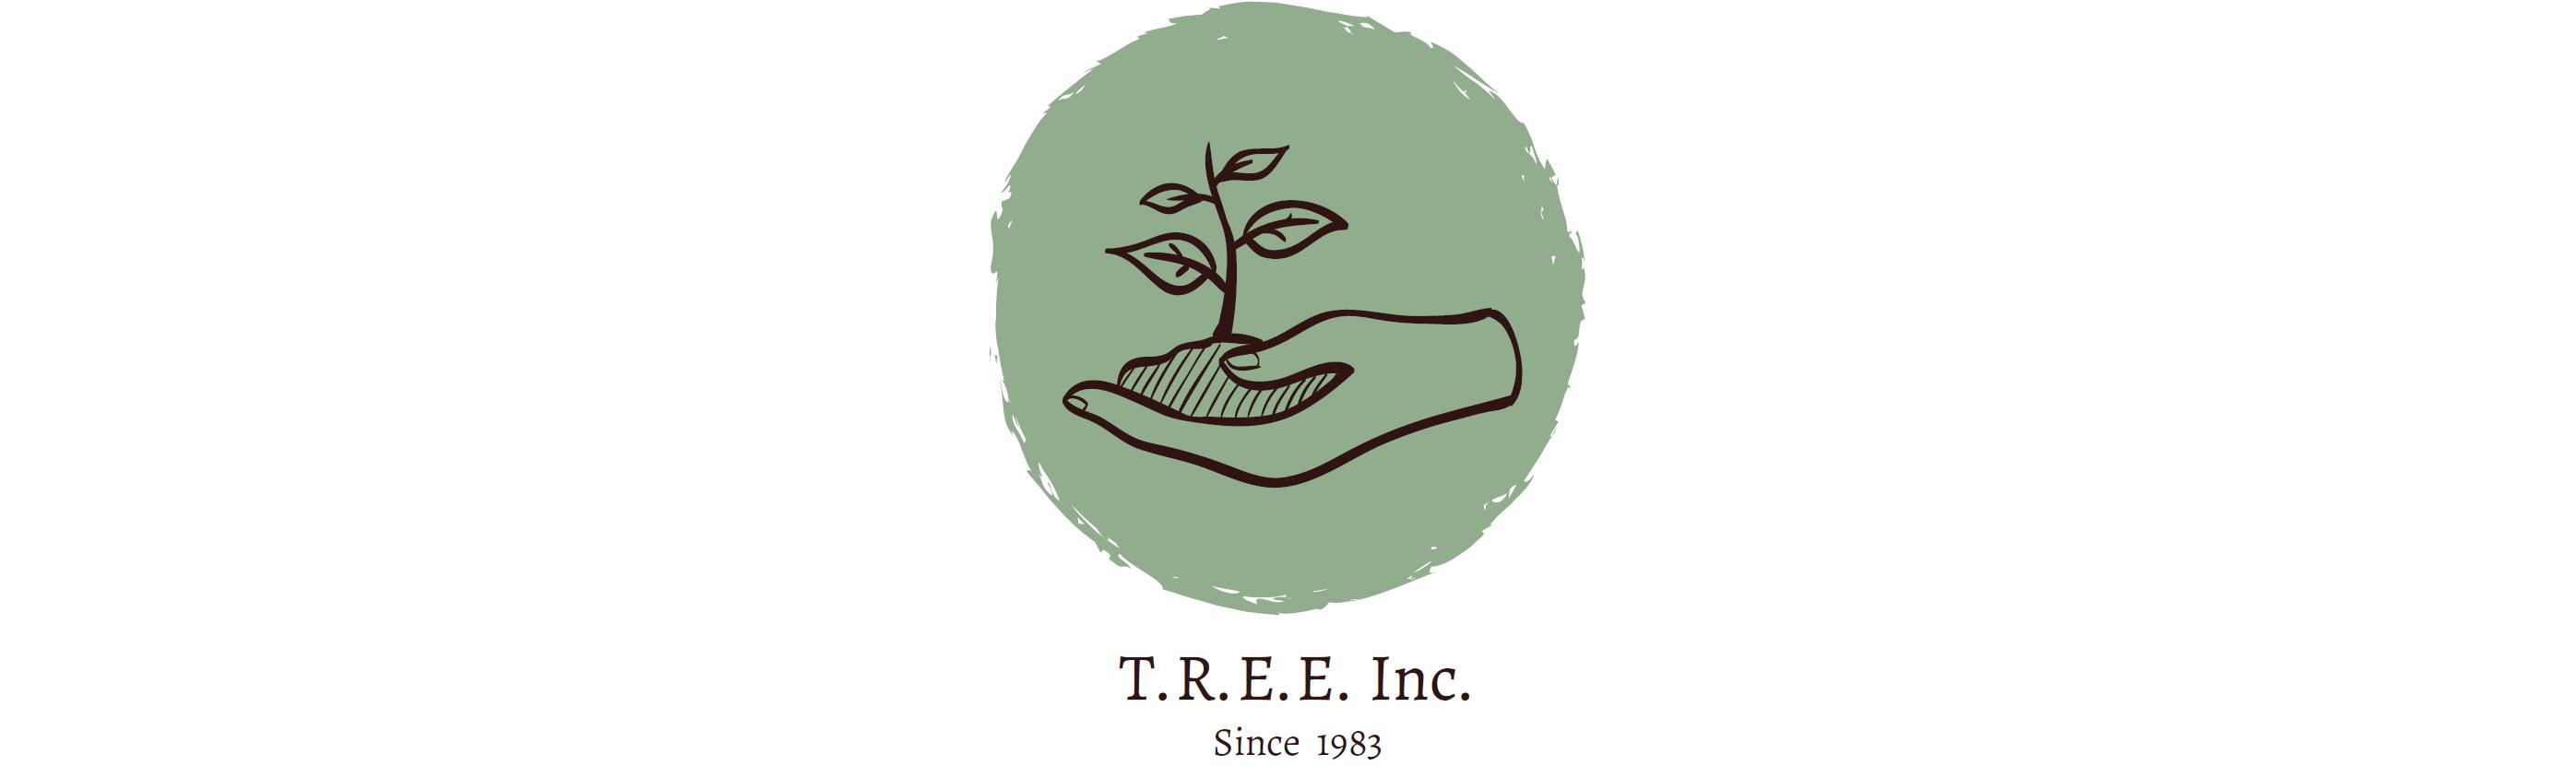 Tree, Inc.